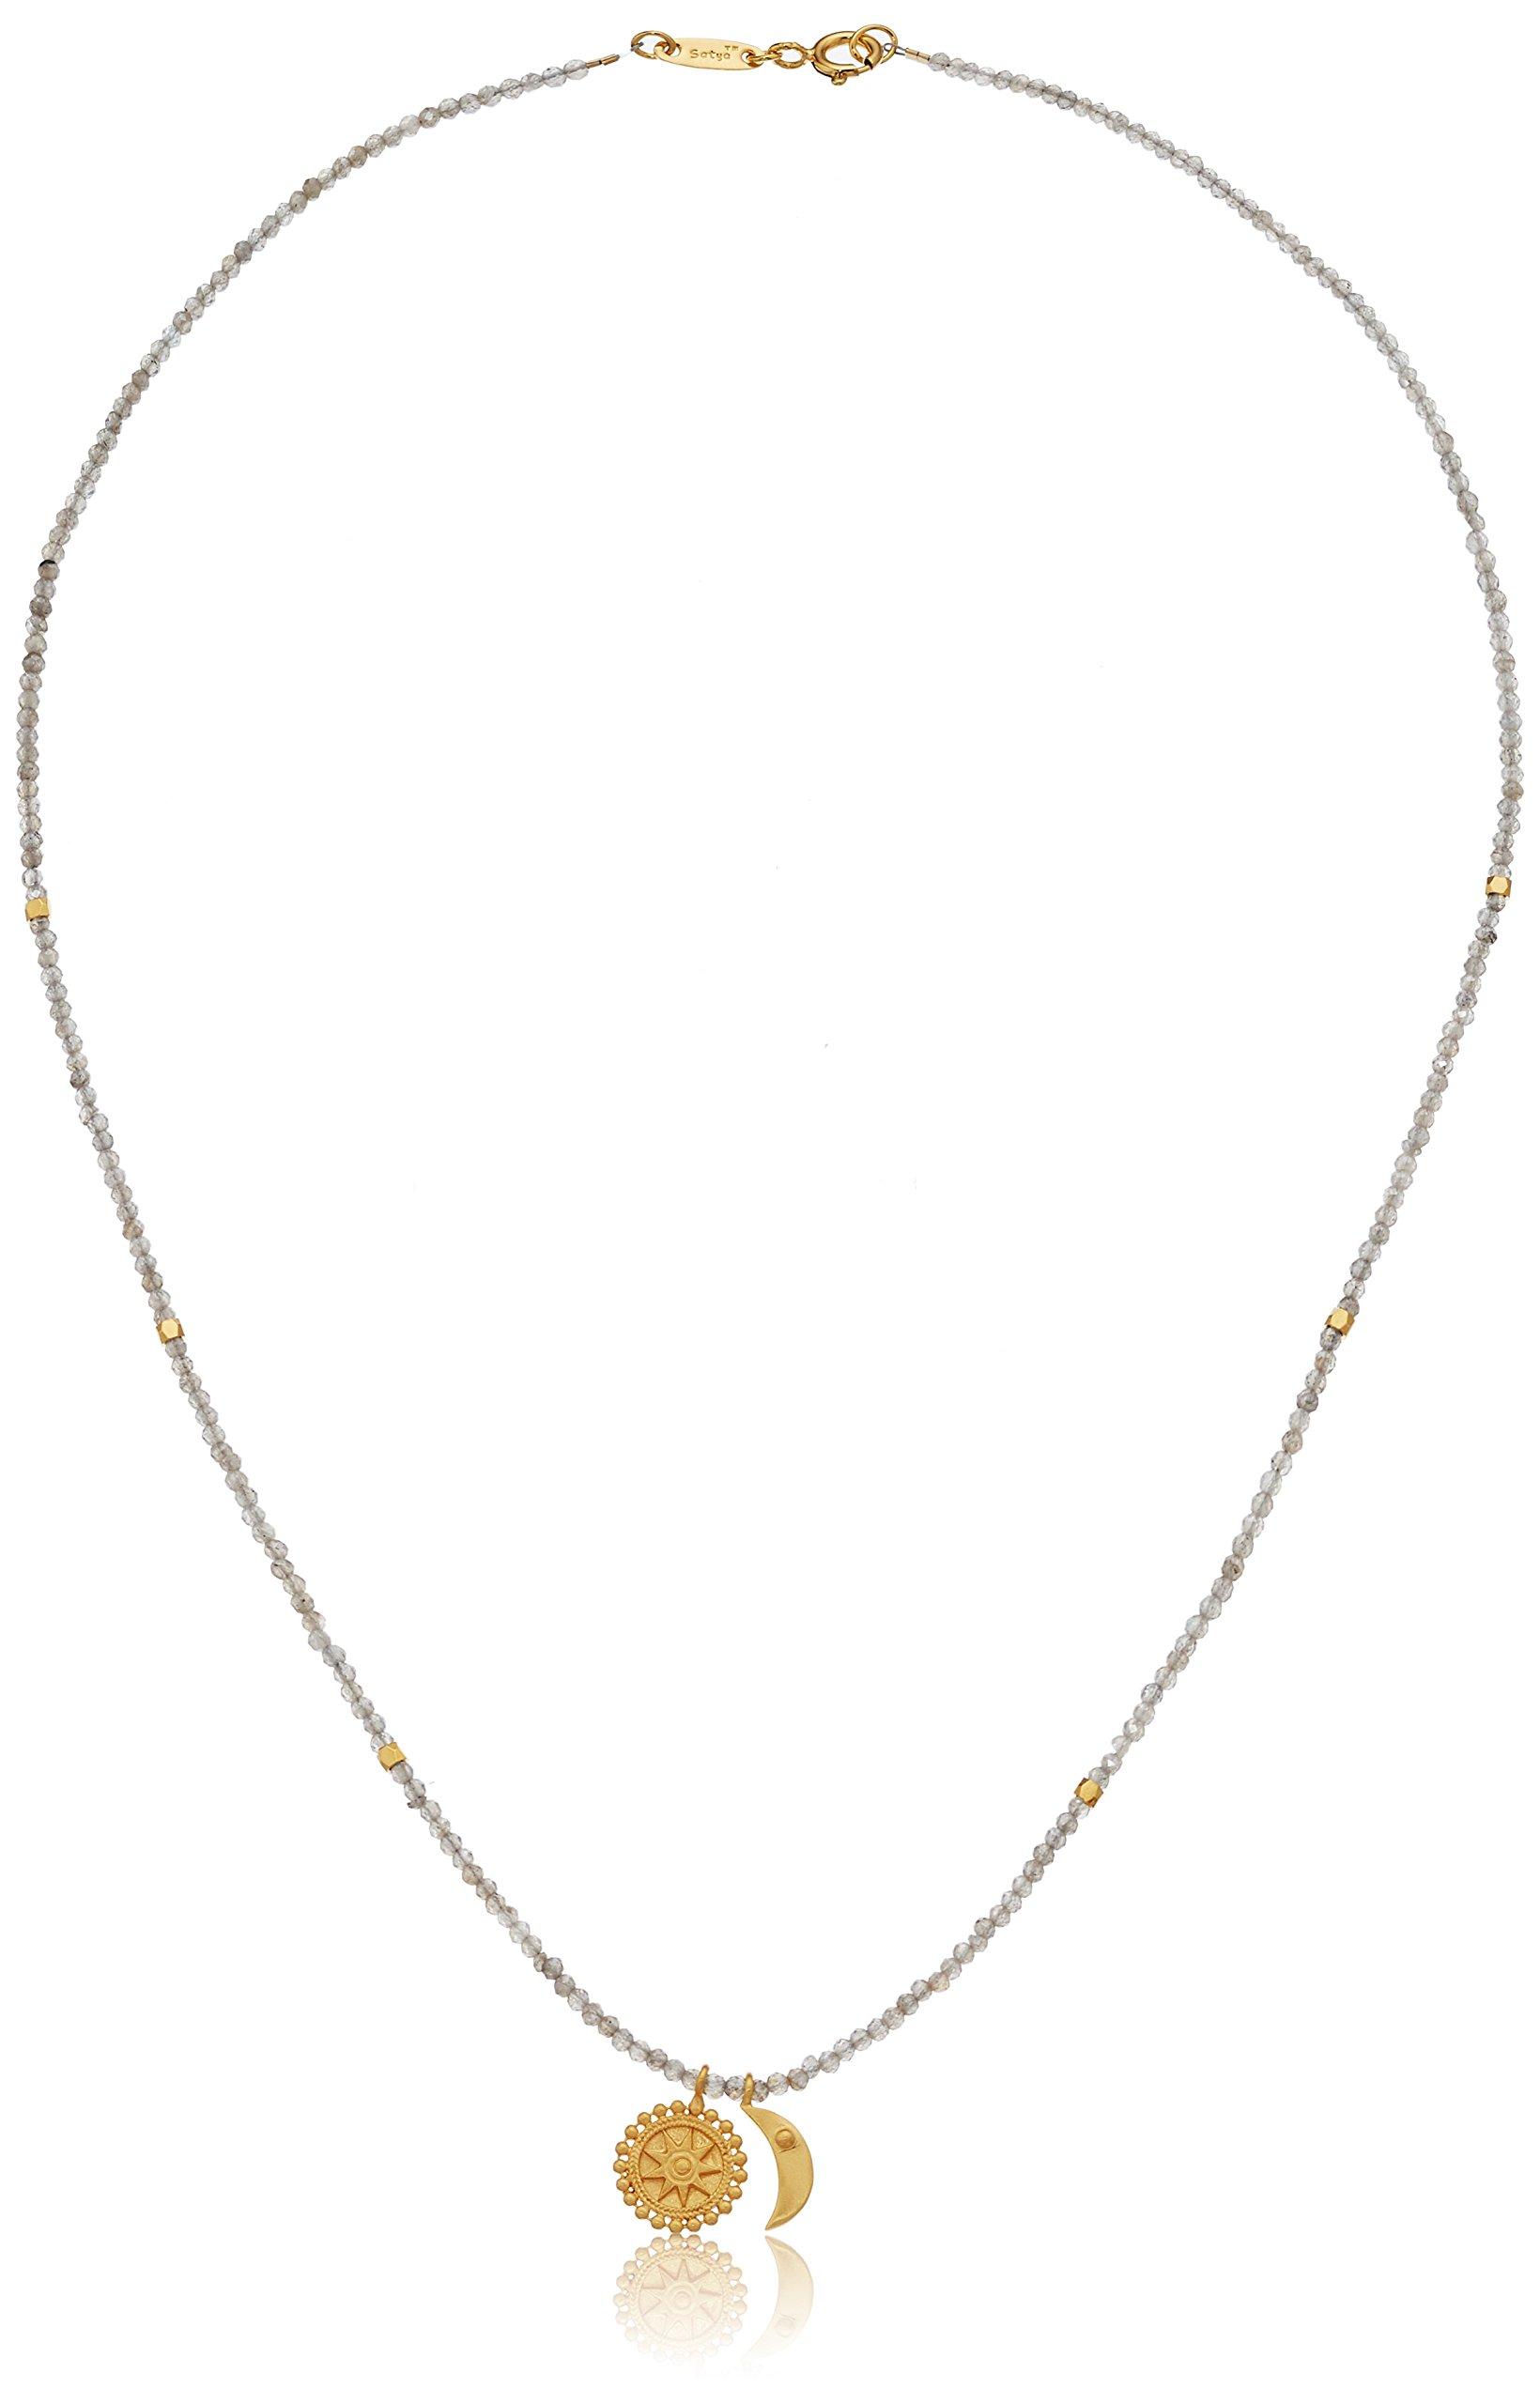 Satya Jewelry Celestial Goddess Mystic Labradorite Gold Mandala Moon Strand Necklace, 18-Inch, Grey